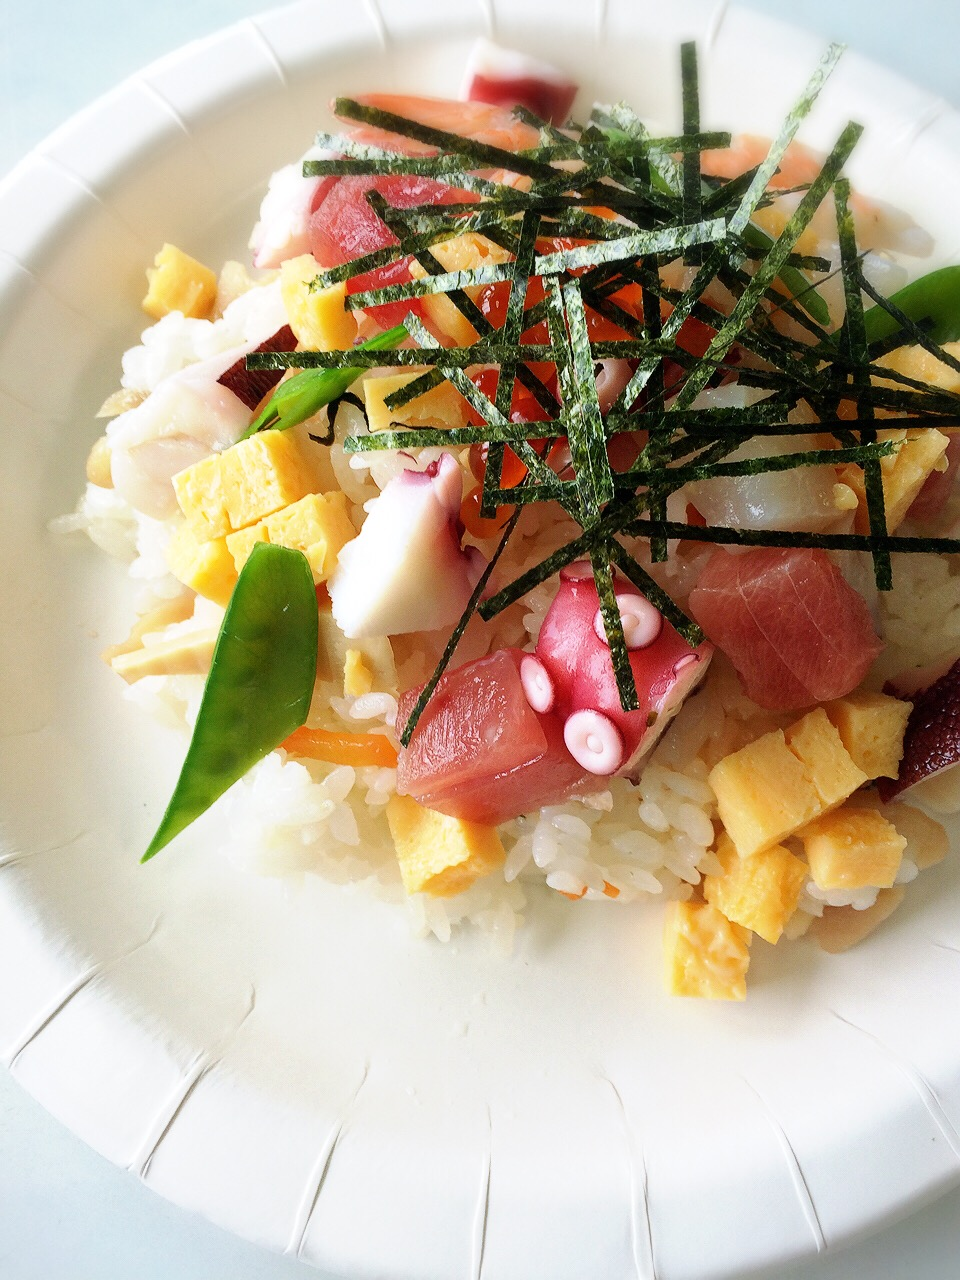 川崎市地方卸売市場南部市場海鮮ちらし寿司